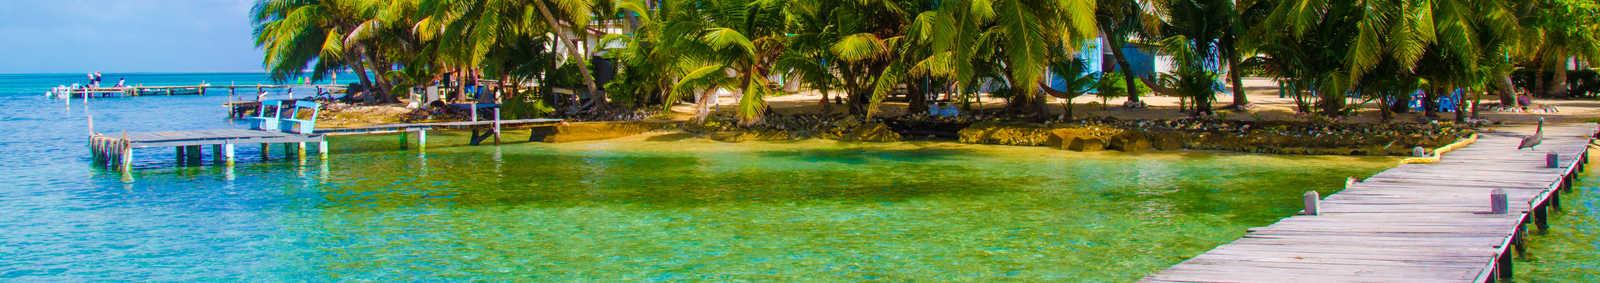 Jetty Pier of an beautiful Island, Caribbean